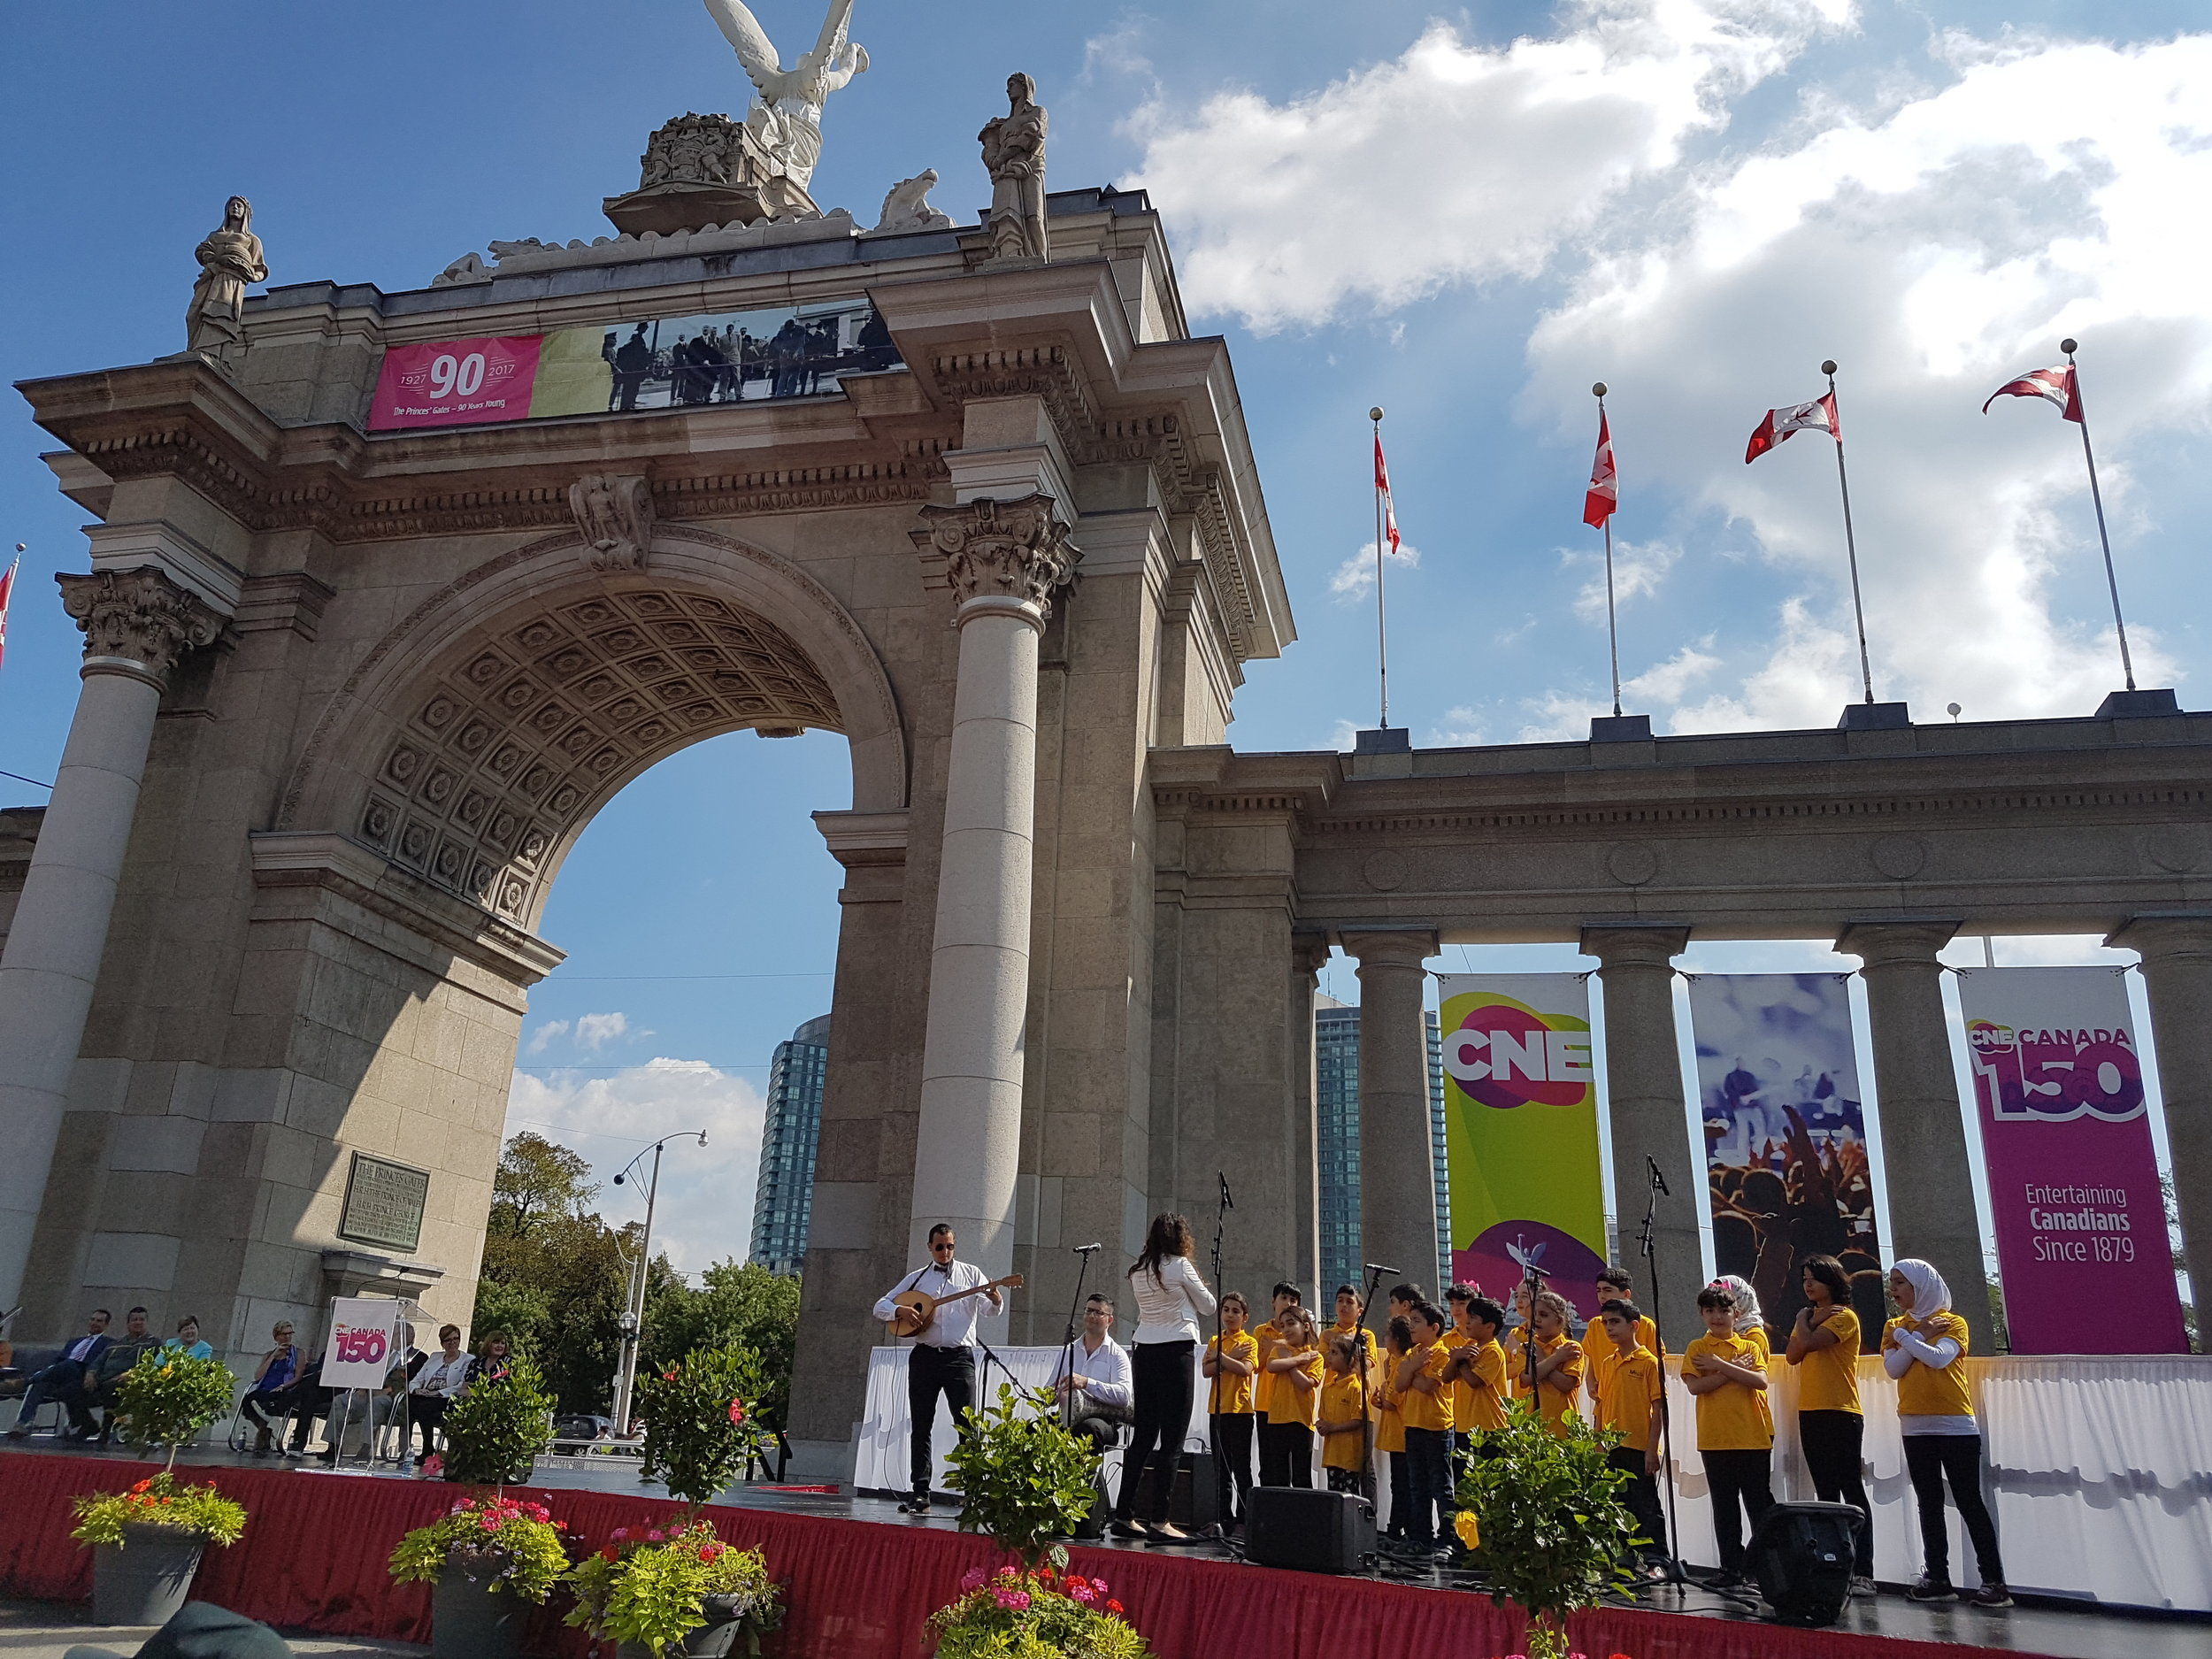 Aug 18 2017, CNE Opening Ceremony